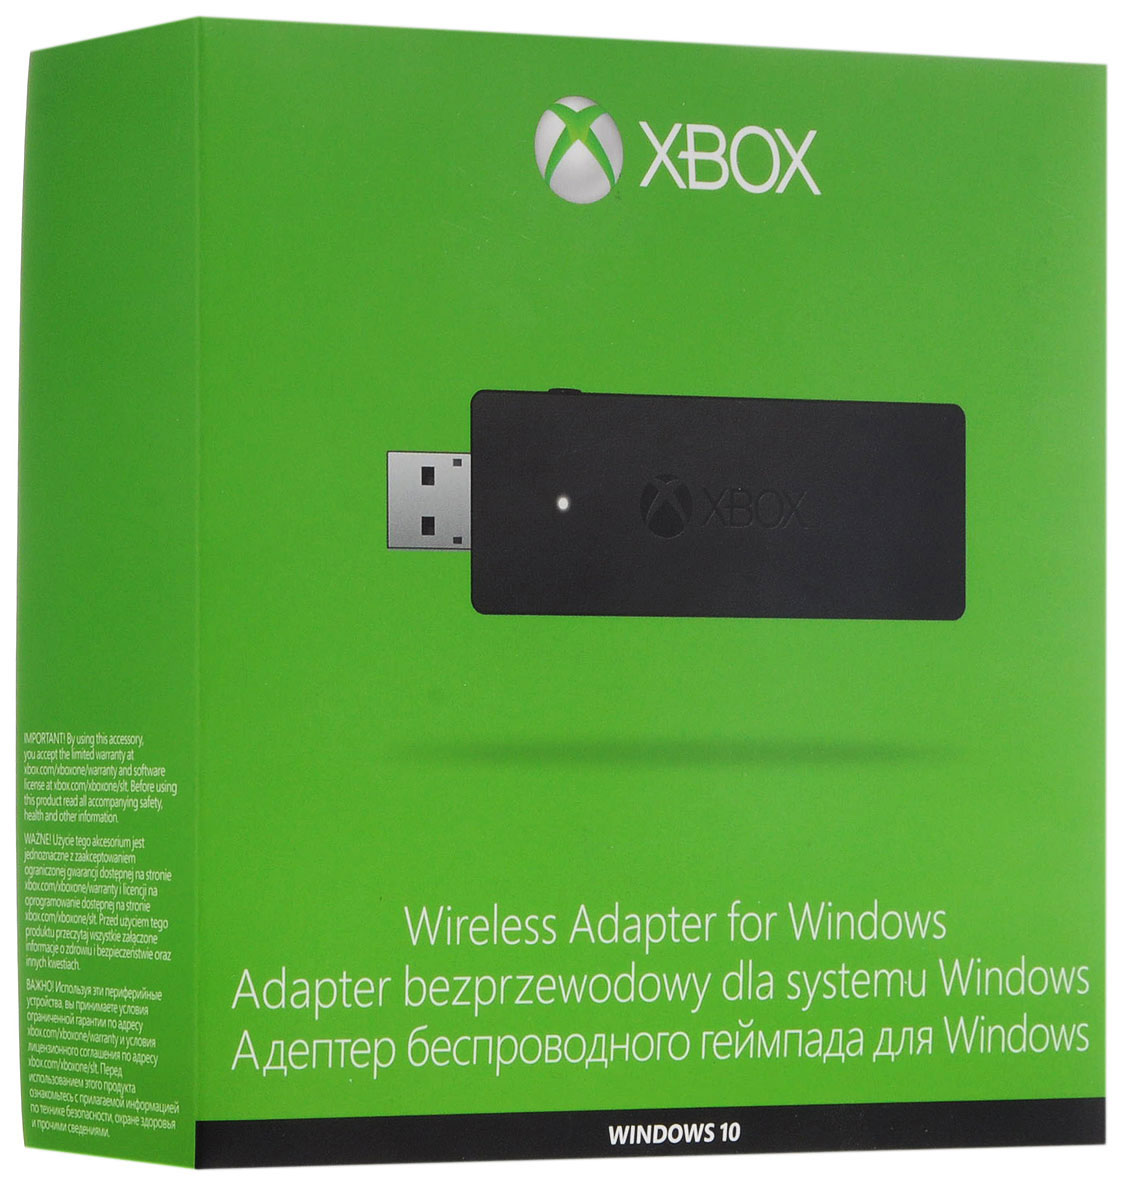 Xbox One ПК адаптер для беспроводного геймпада (HK9-00004) - Аксессуары